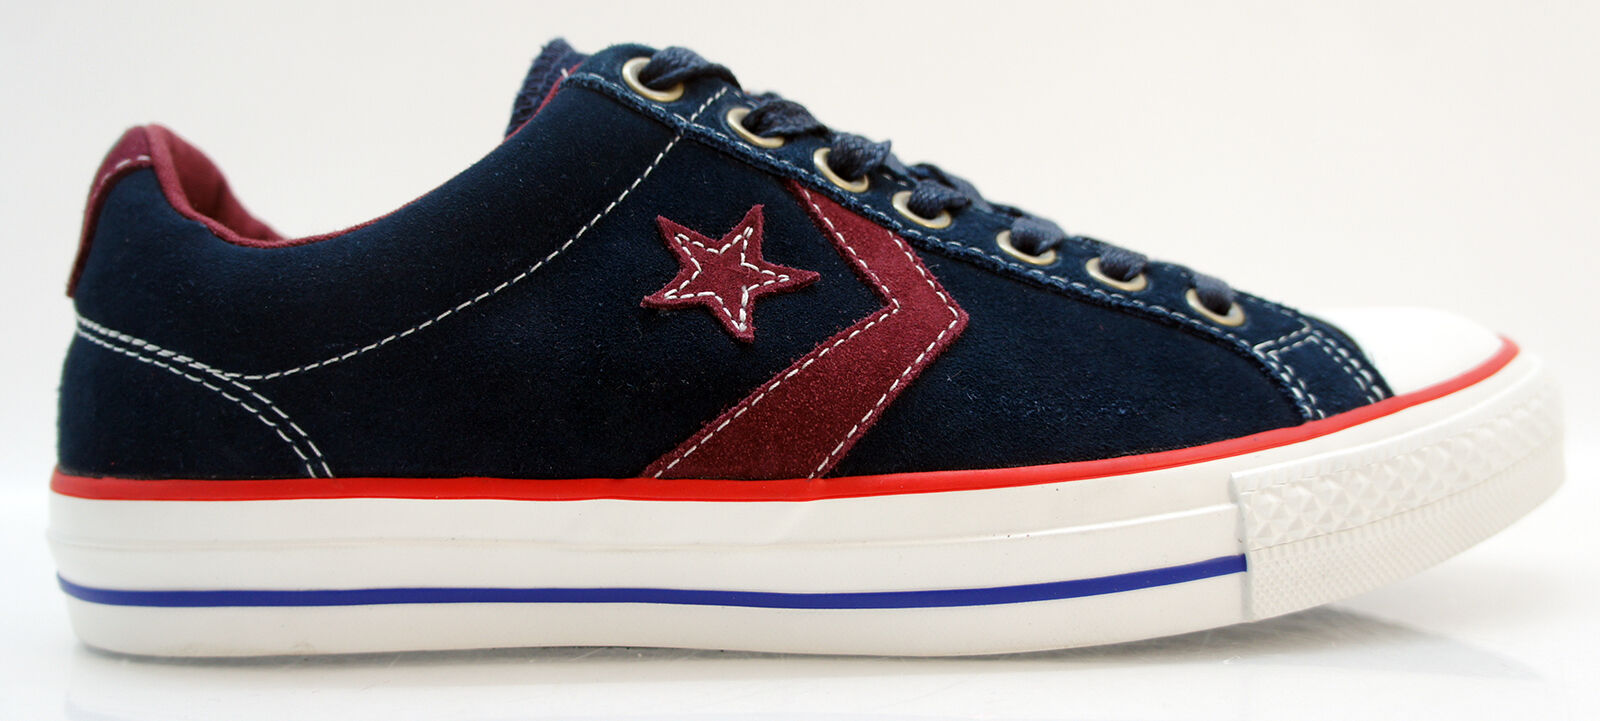 Converse All Star Plyr Halb Schuhe Turnschuhe Turnschuhe blau Gr. 41,5